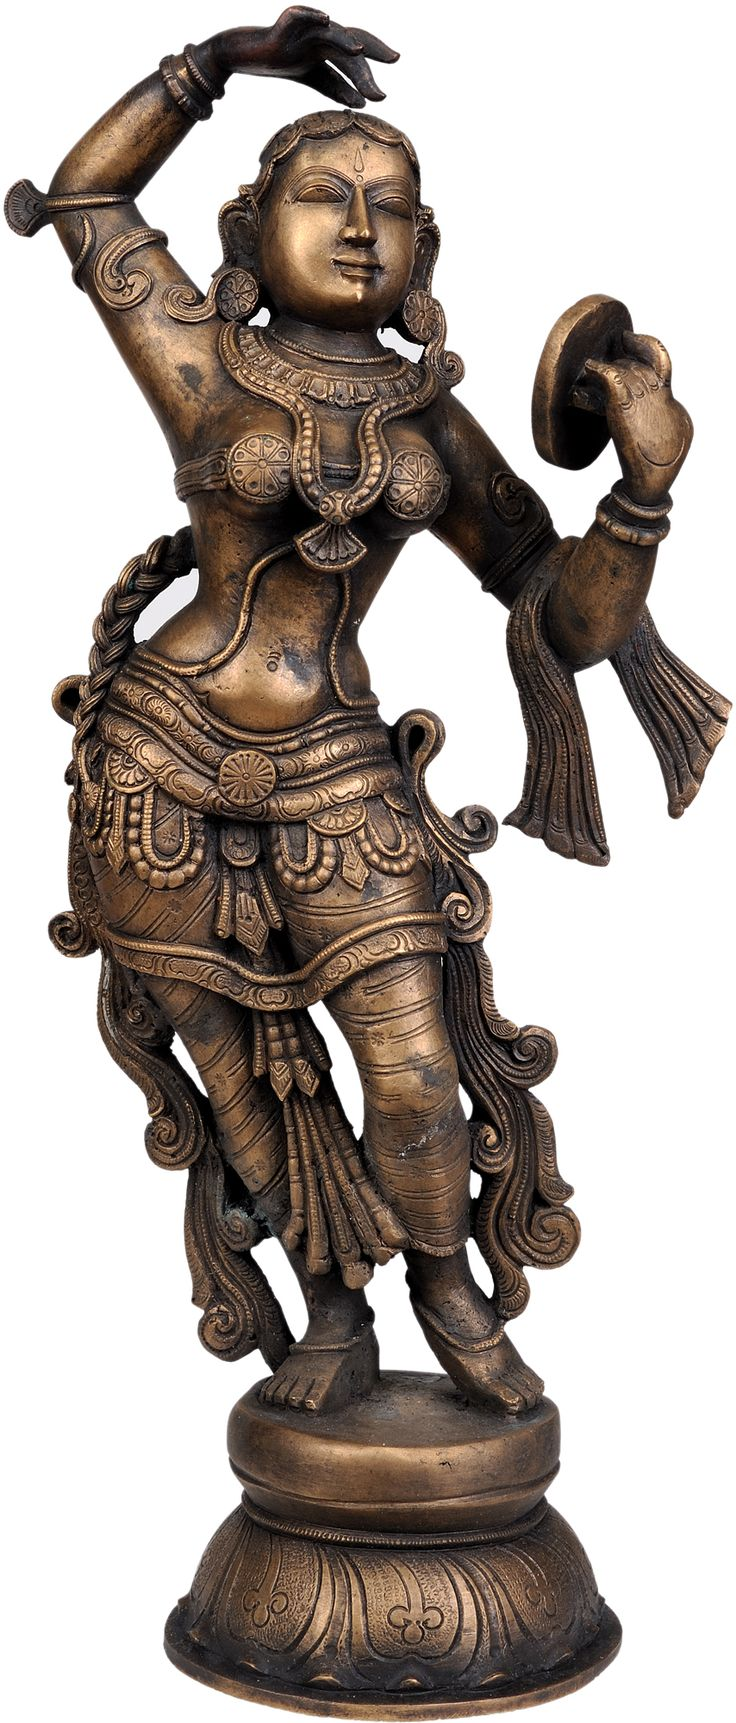 The Apsara Applying Vermillion (A Sculpture Inspired by Khajuraho)